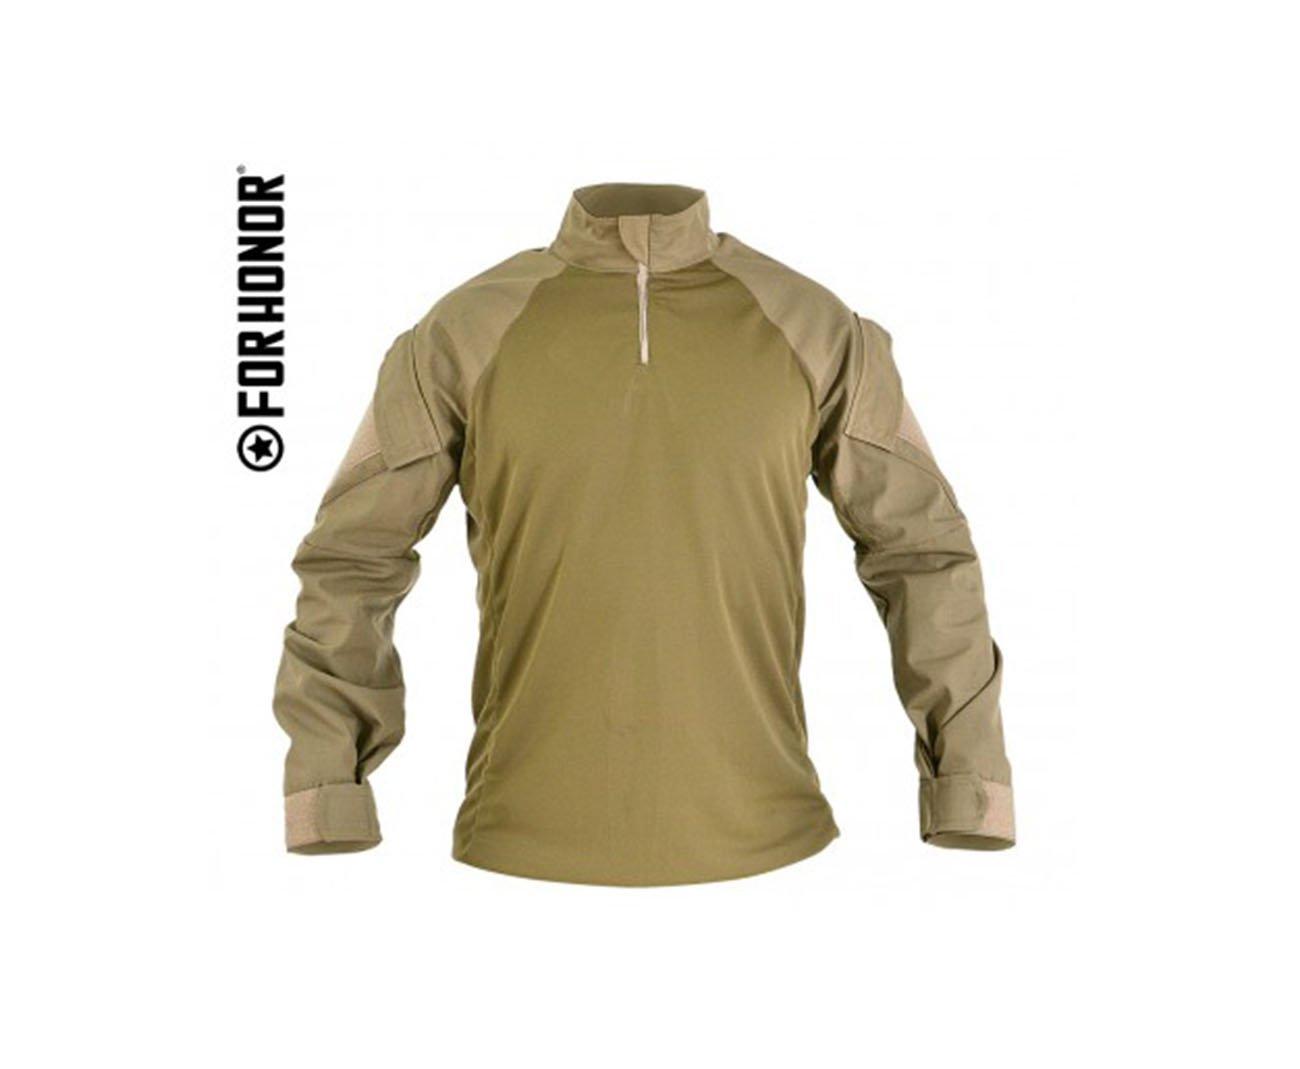 Camisa De Combate 711 Desert (combat Shirt)- Forhonor